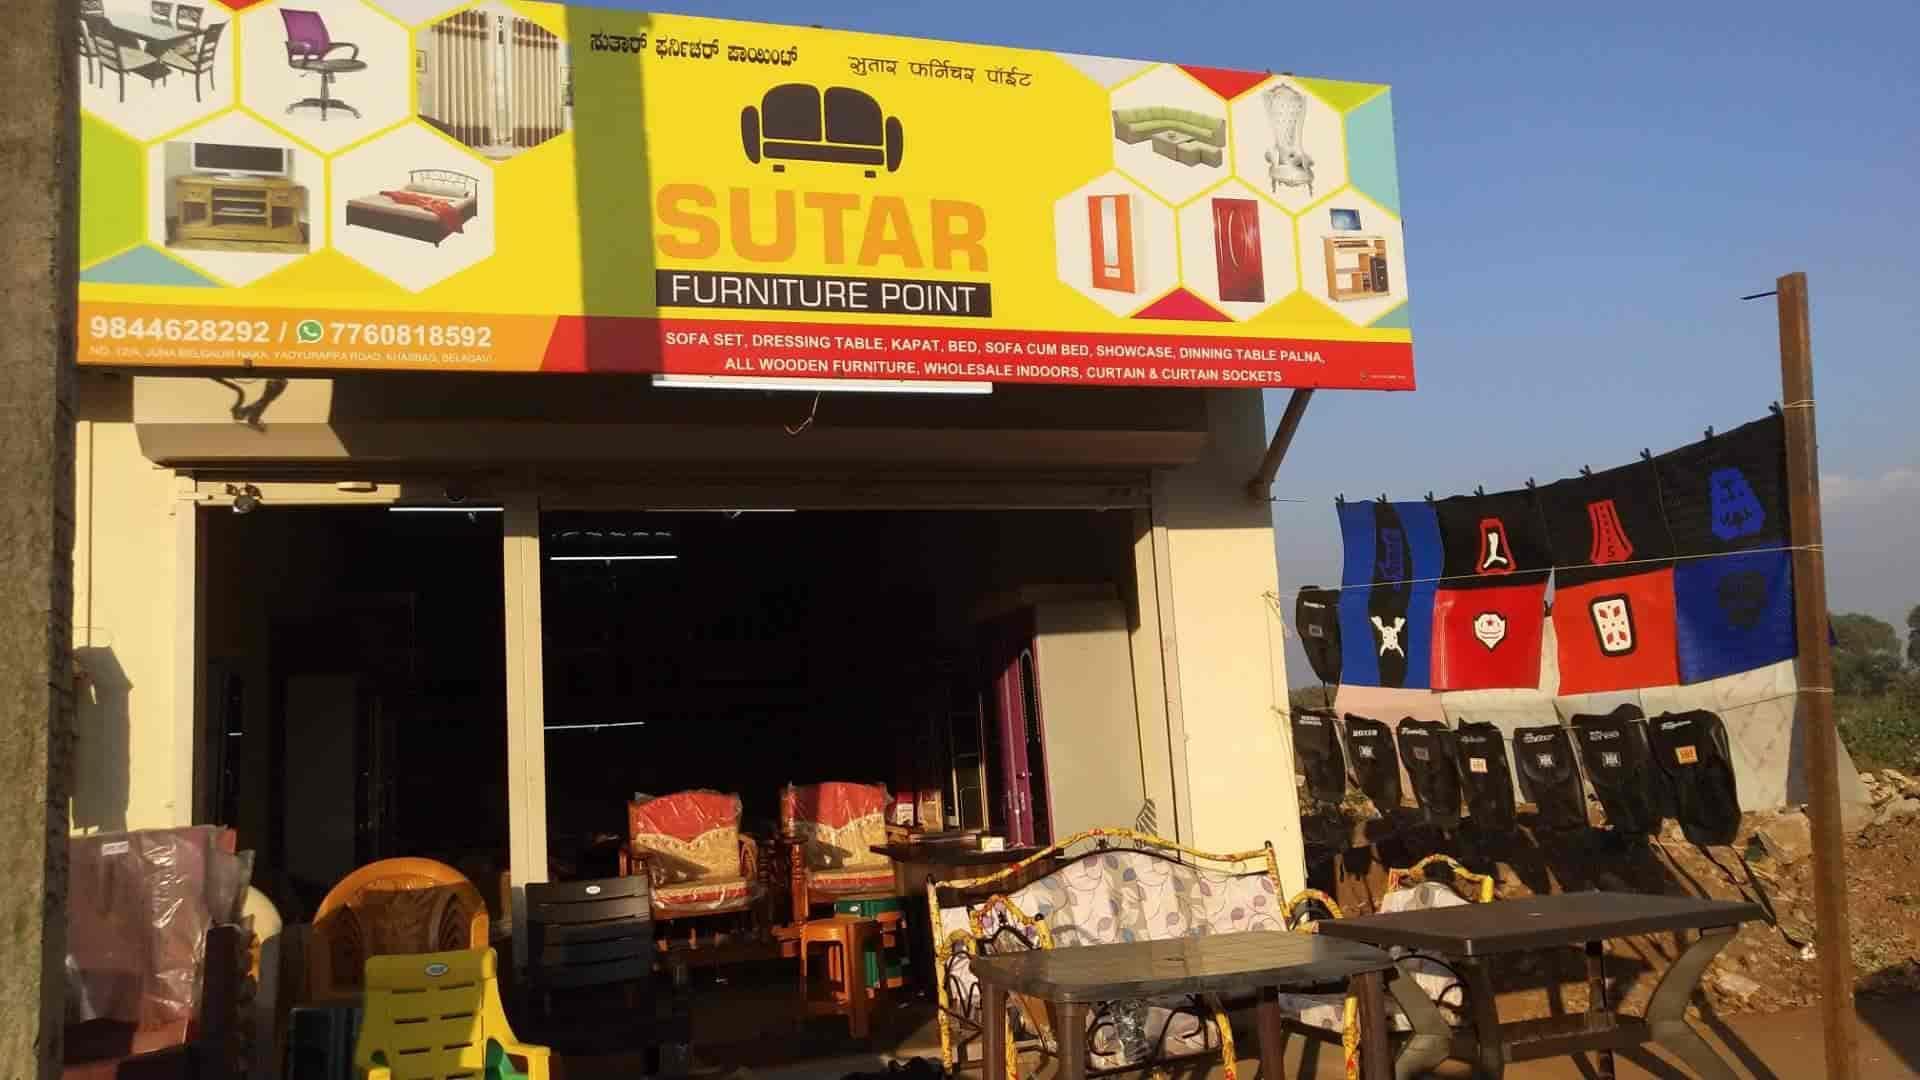 Sutar Furniture Point Photos, Khas Bagh, Belgaum- Pictures